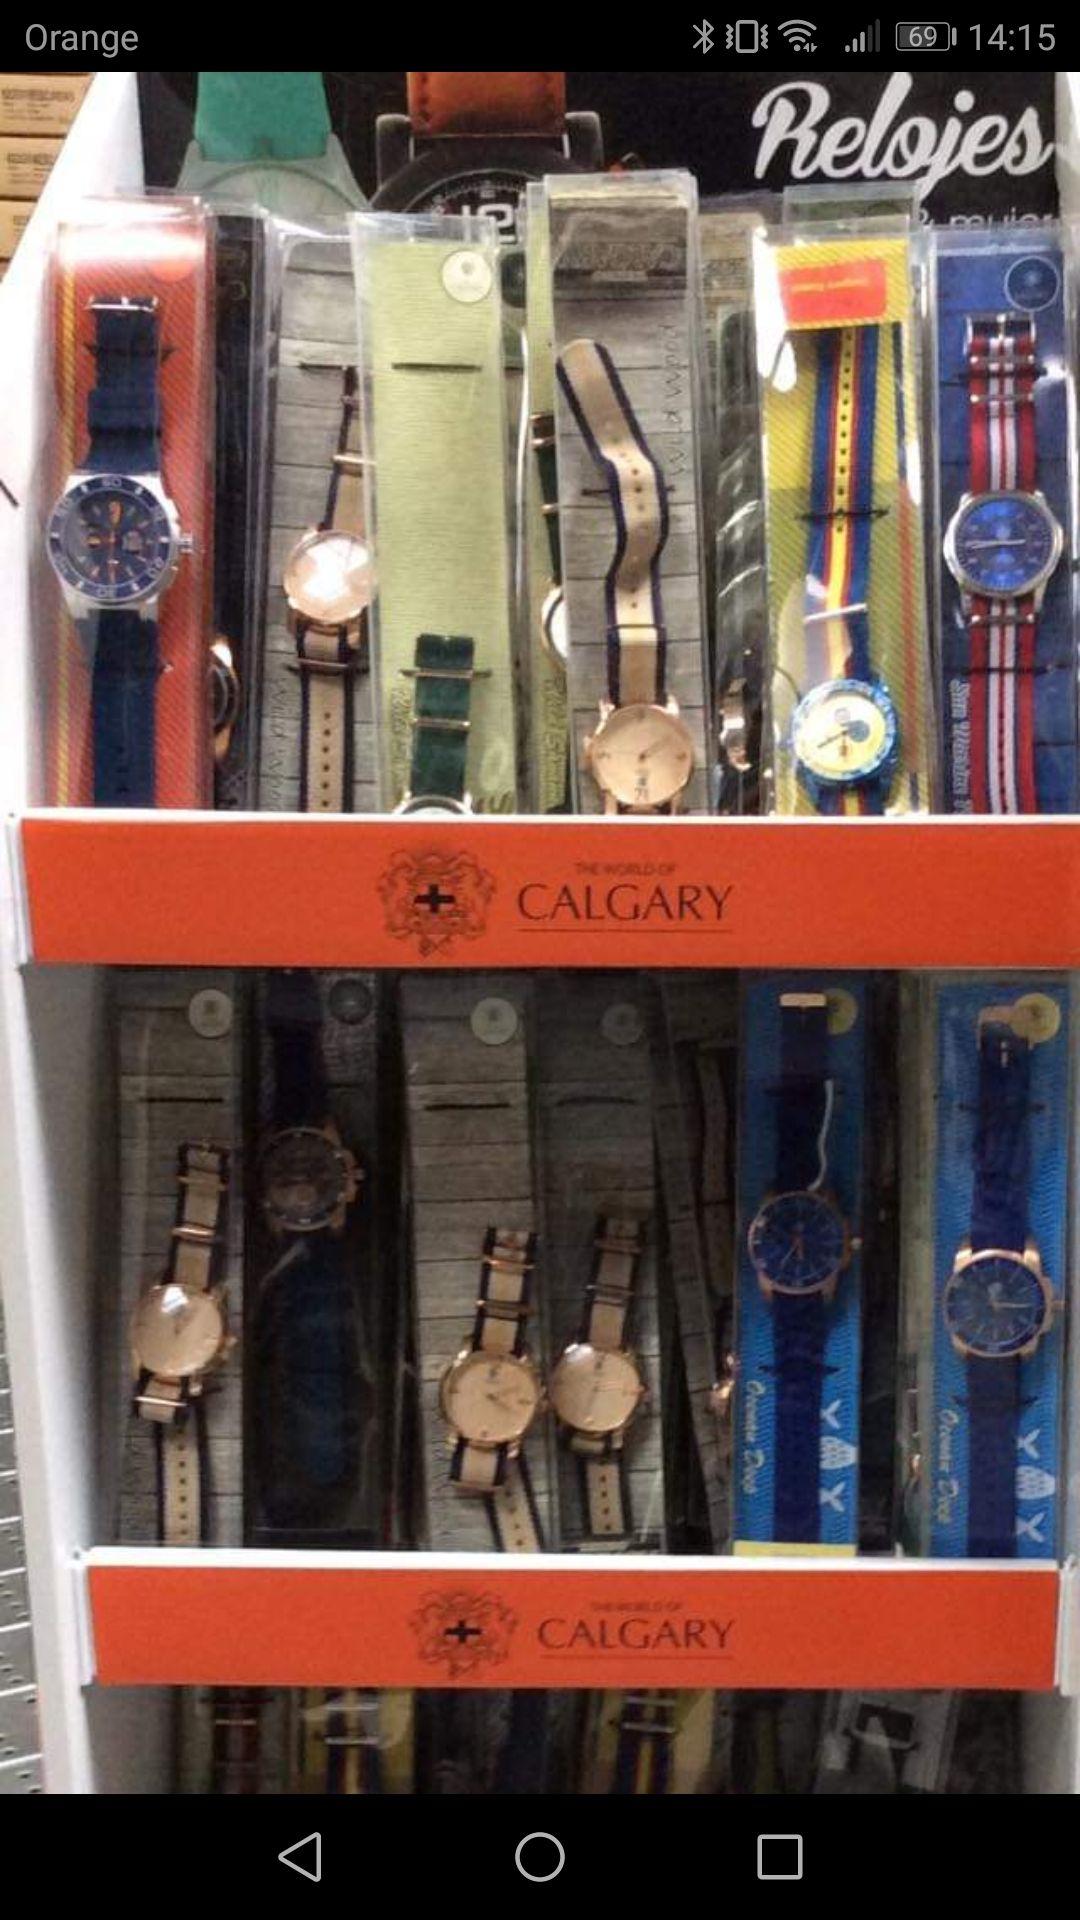 RELOJ DE HOMBRE O MUJER de regalo con 40€ de compra Calgary Carrefour